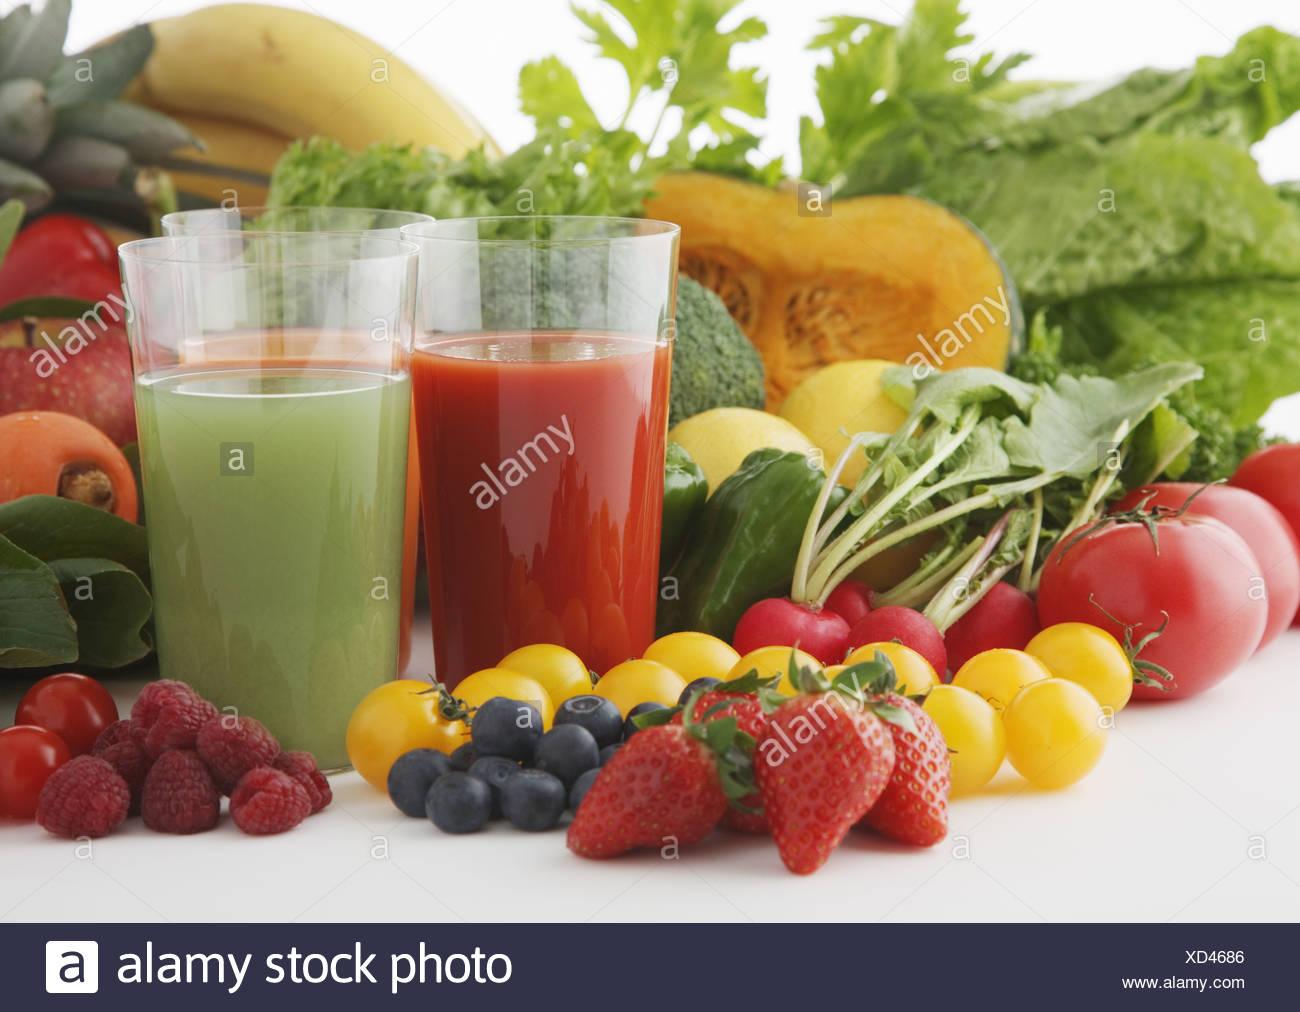 Vegetable juice - Stock Image